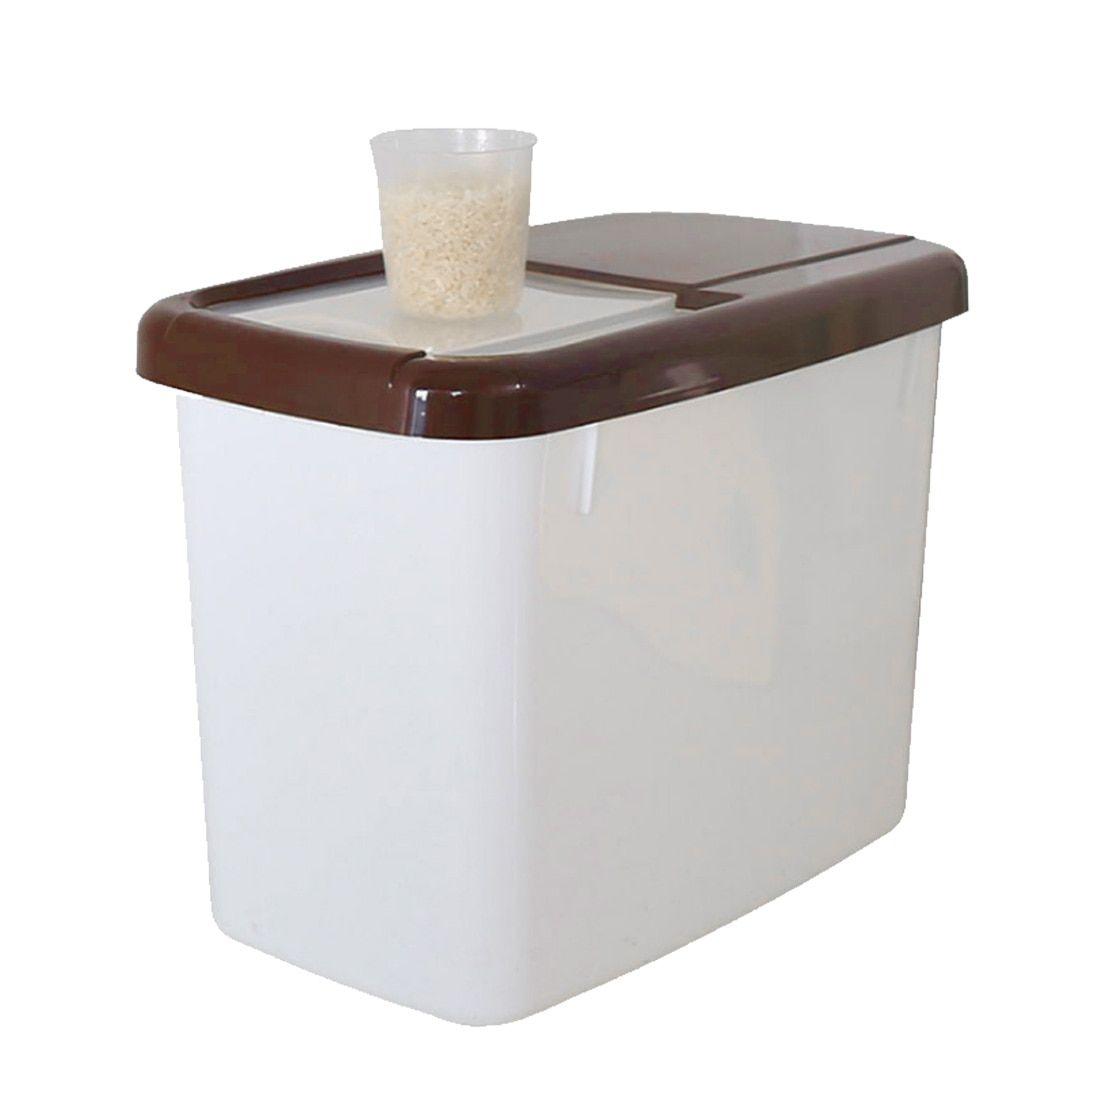 10kg Plastic Kitchen Rice Container Storage Food Cereal Storage Box Bins Sealed Moistureproof Storage Grain With Measuring Cup Rice Container Storage Cereal Storage Cereal Recipes